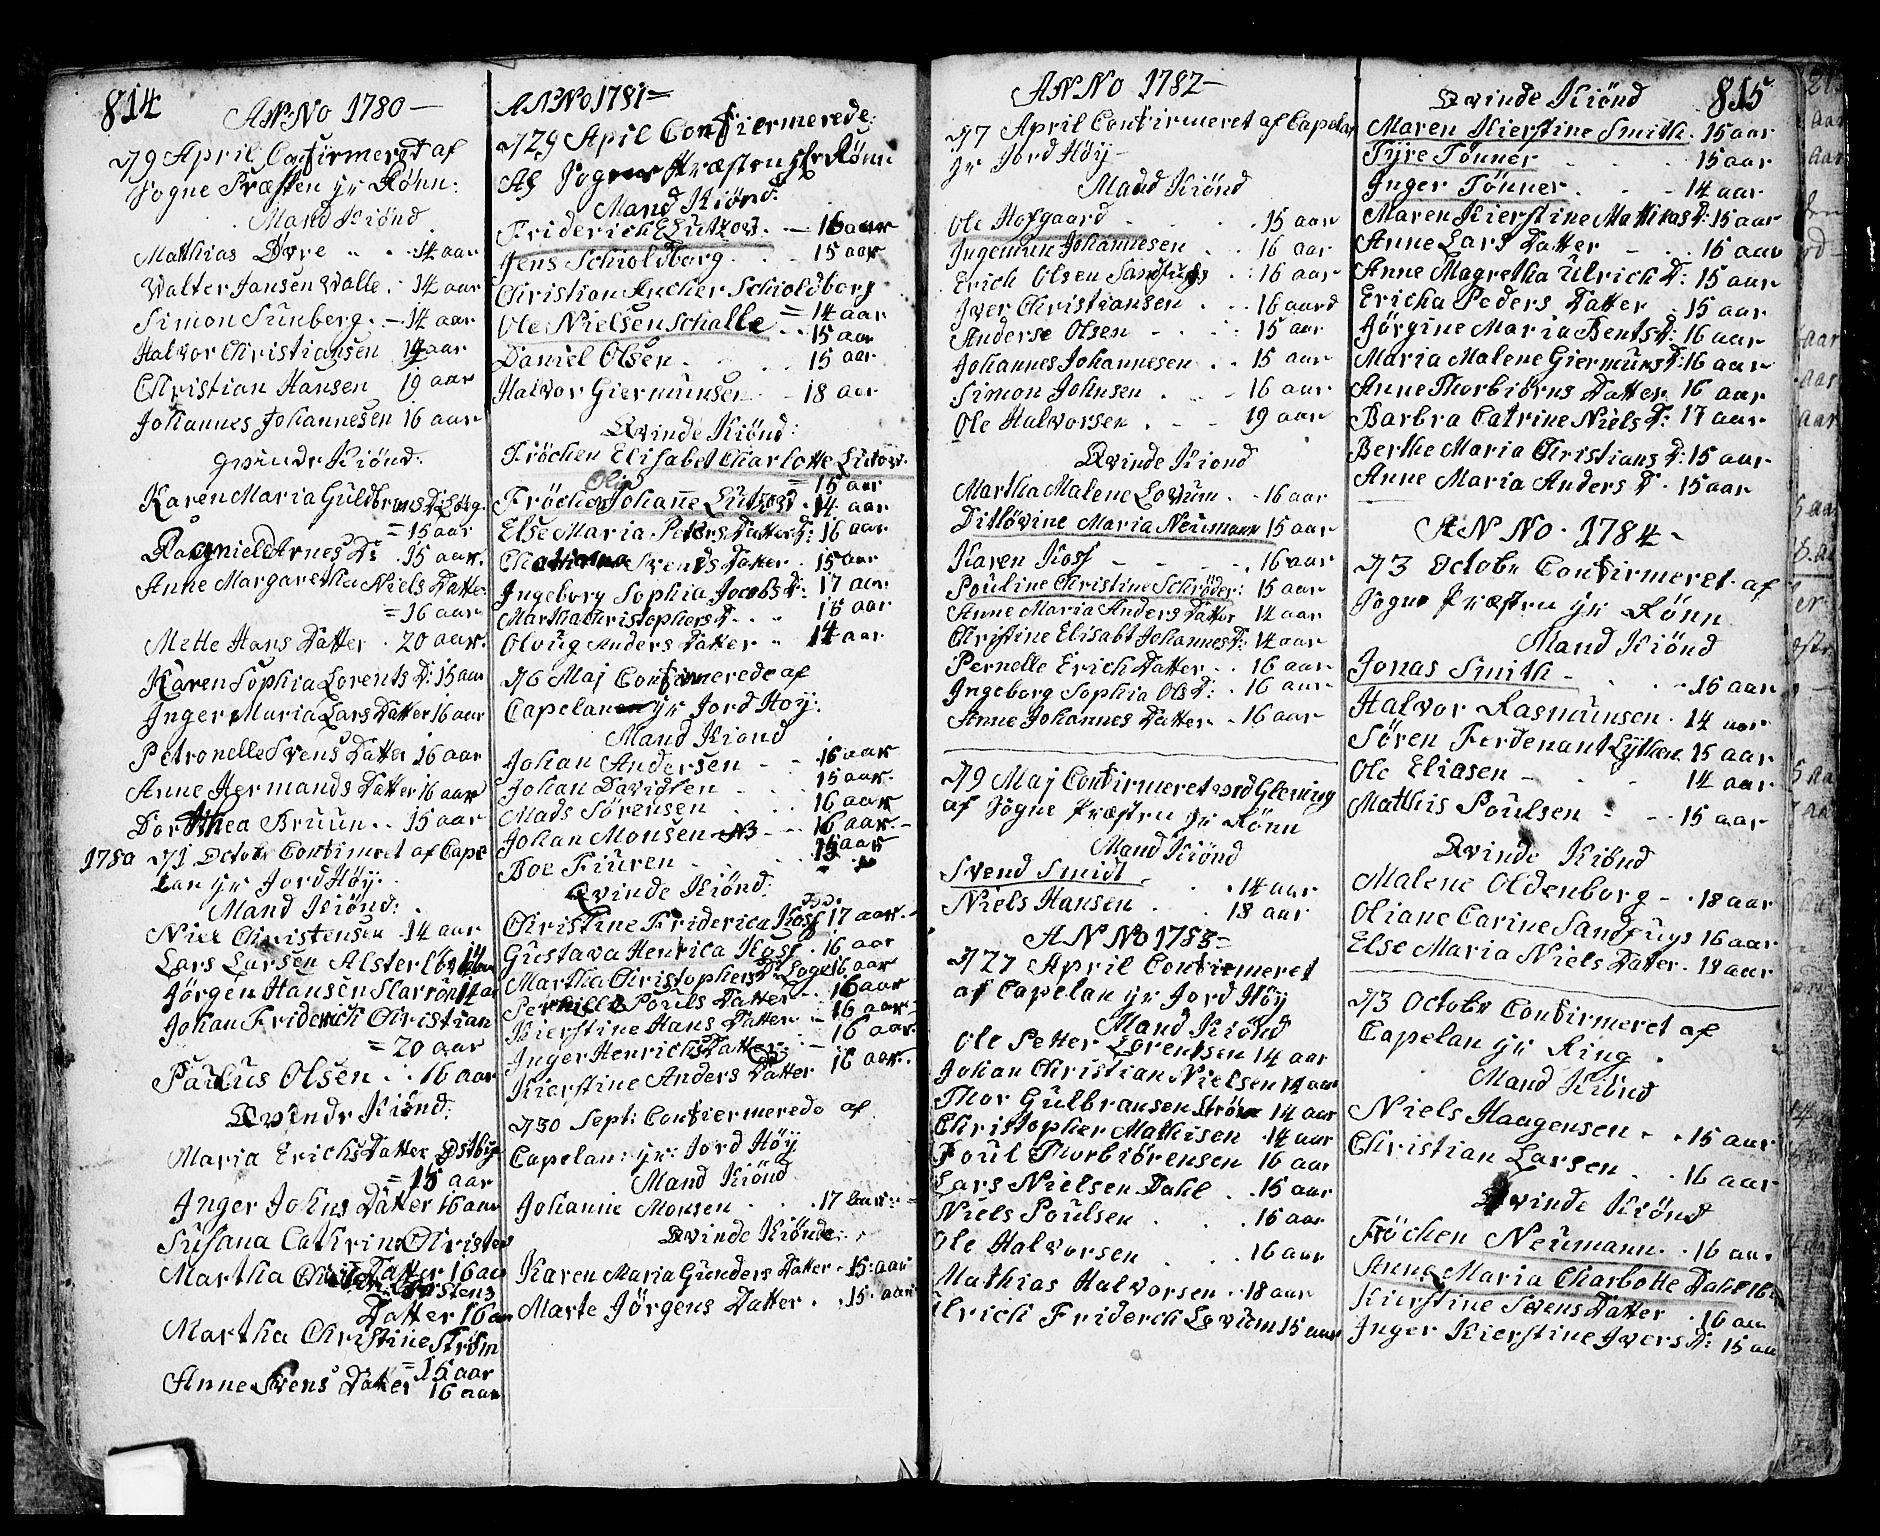 SAO, Fredrikstad prestekontor Kirkebøker, F/Fa/L0002: Ministerialbok nr. 2, 1750-1804, s. 814-815